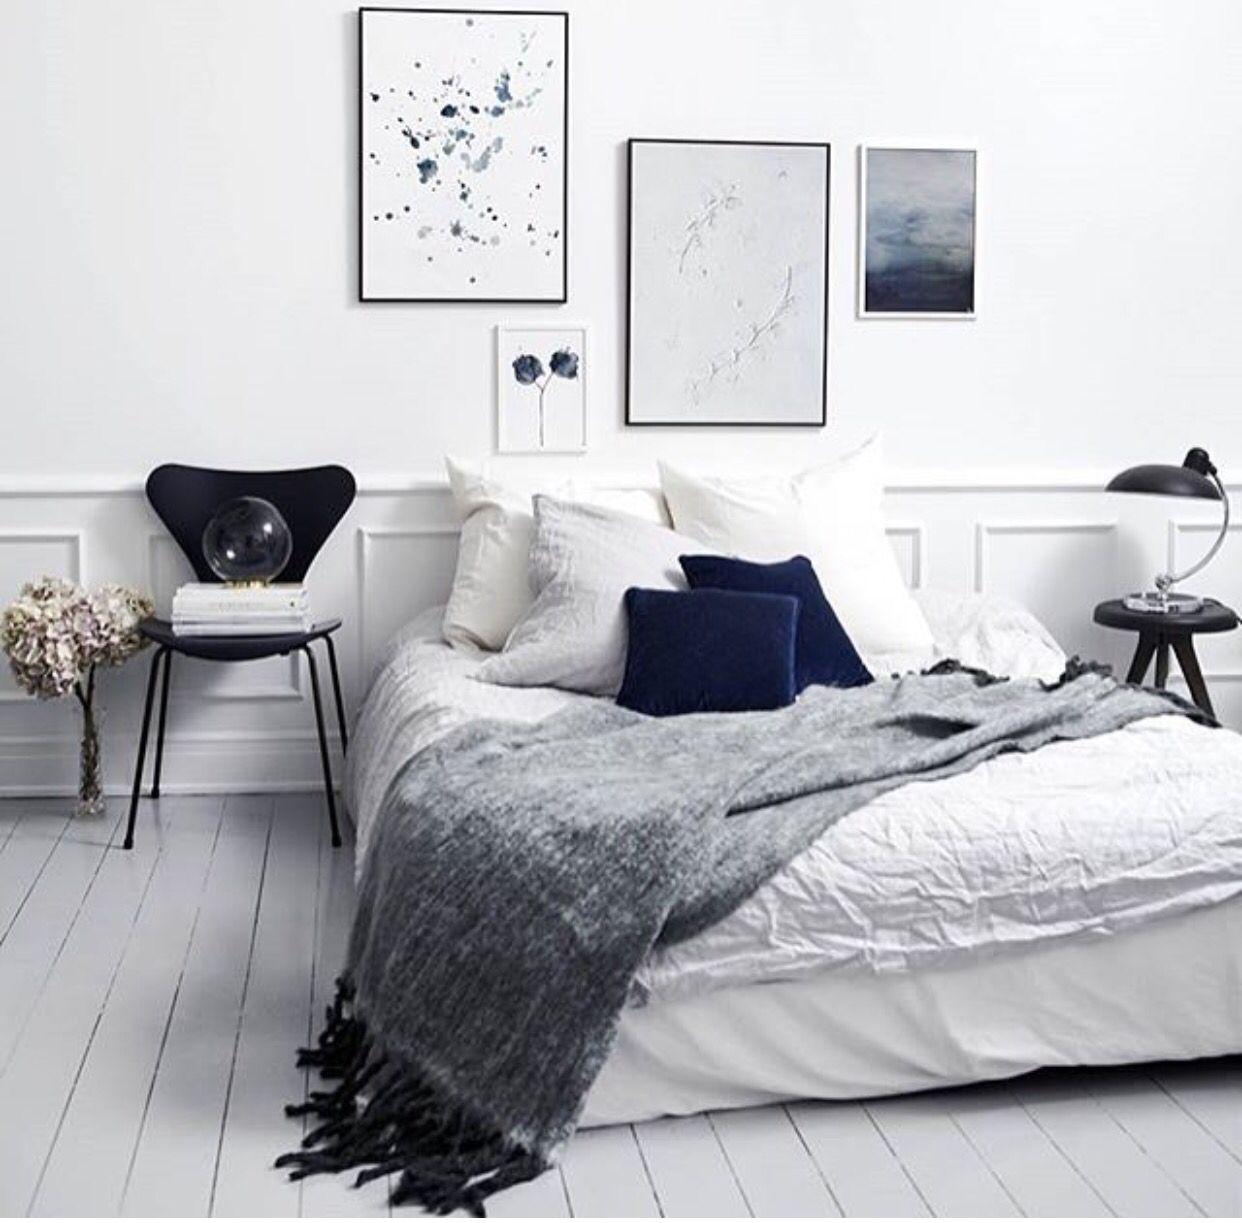 Scandinavian Bedroom Curtains Bedroom Chandeliers Menards Bedroom Athletics Mule Slippers Bedroom Colour Combination: Pin By Katy Muntyan On Room Inspo In 2018